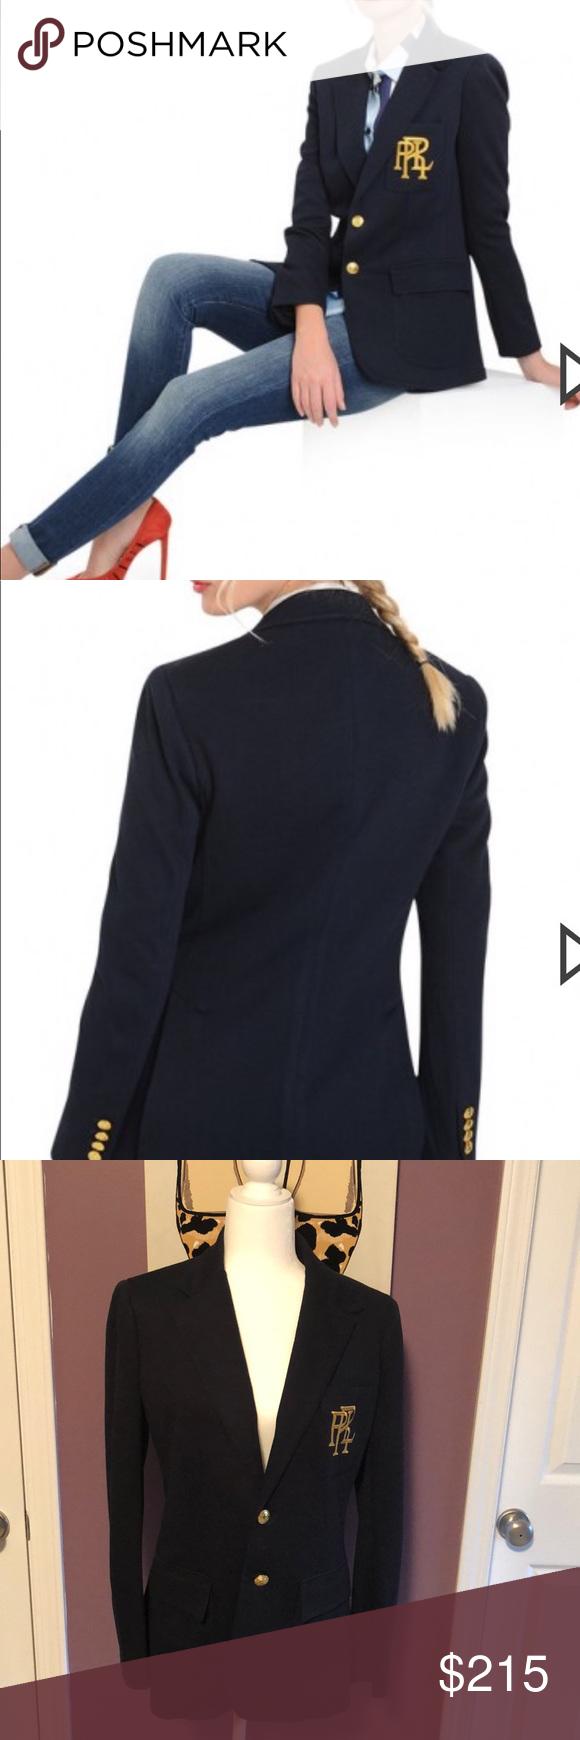 Polo Ralph Lauren Women S Prl Blazer Jacket 10 Fashion Clothes Design Polo Ralph Lauren Women